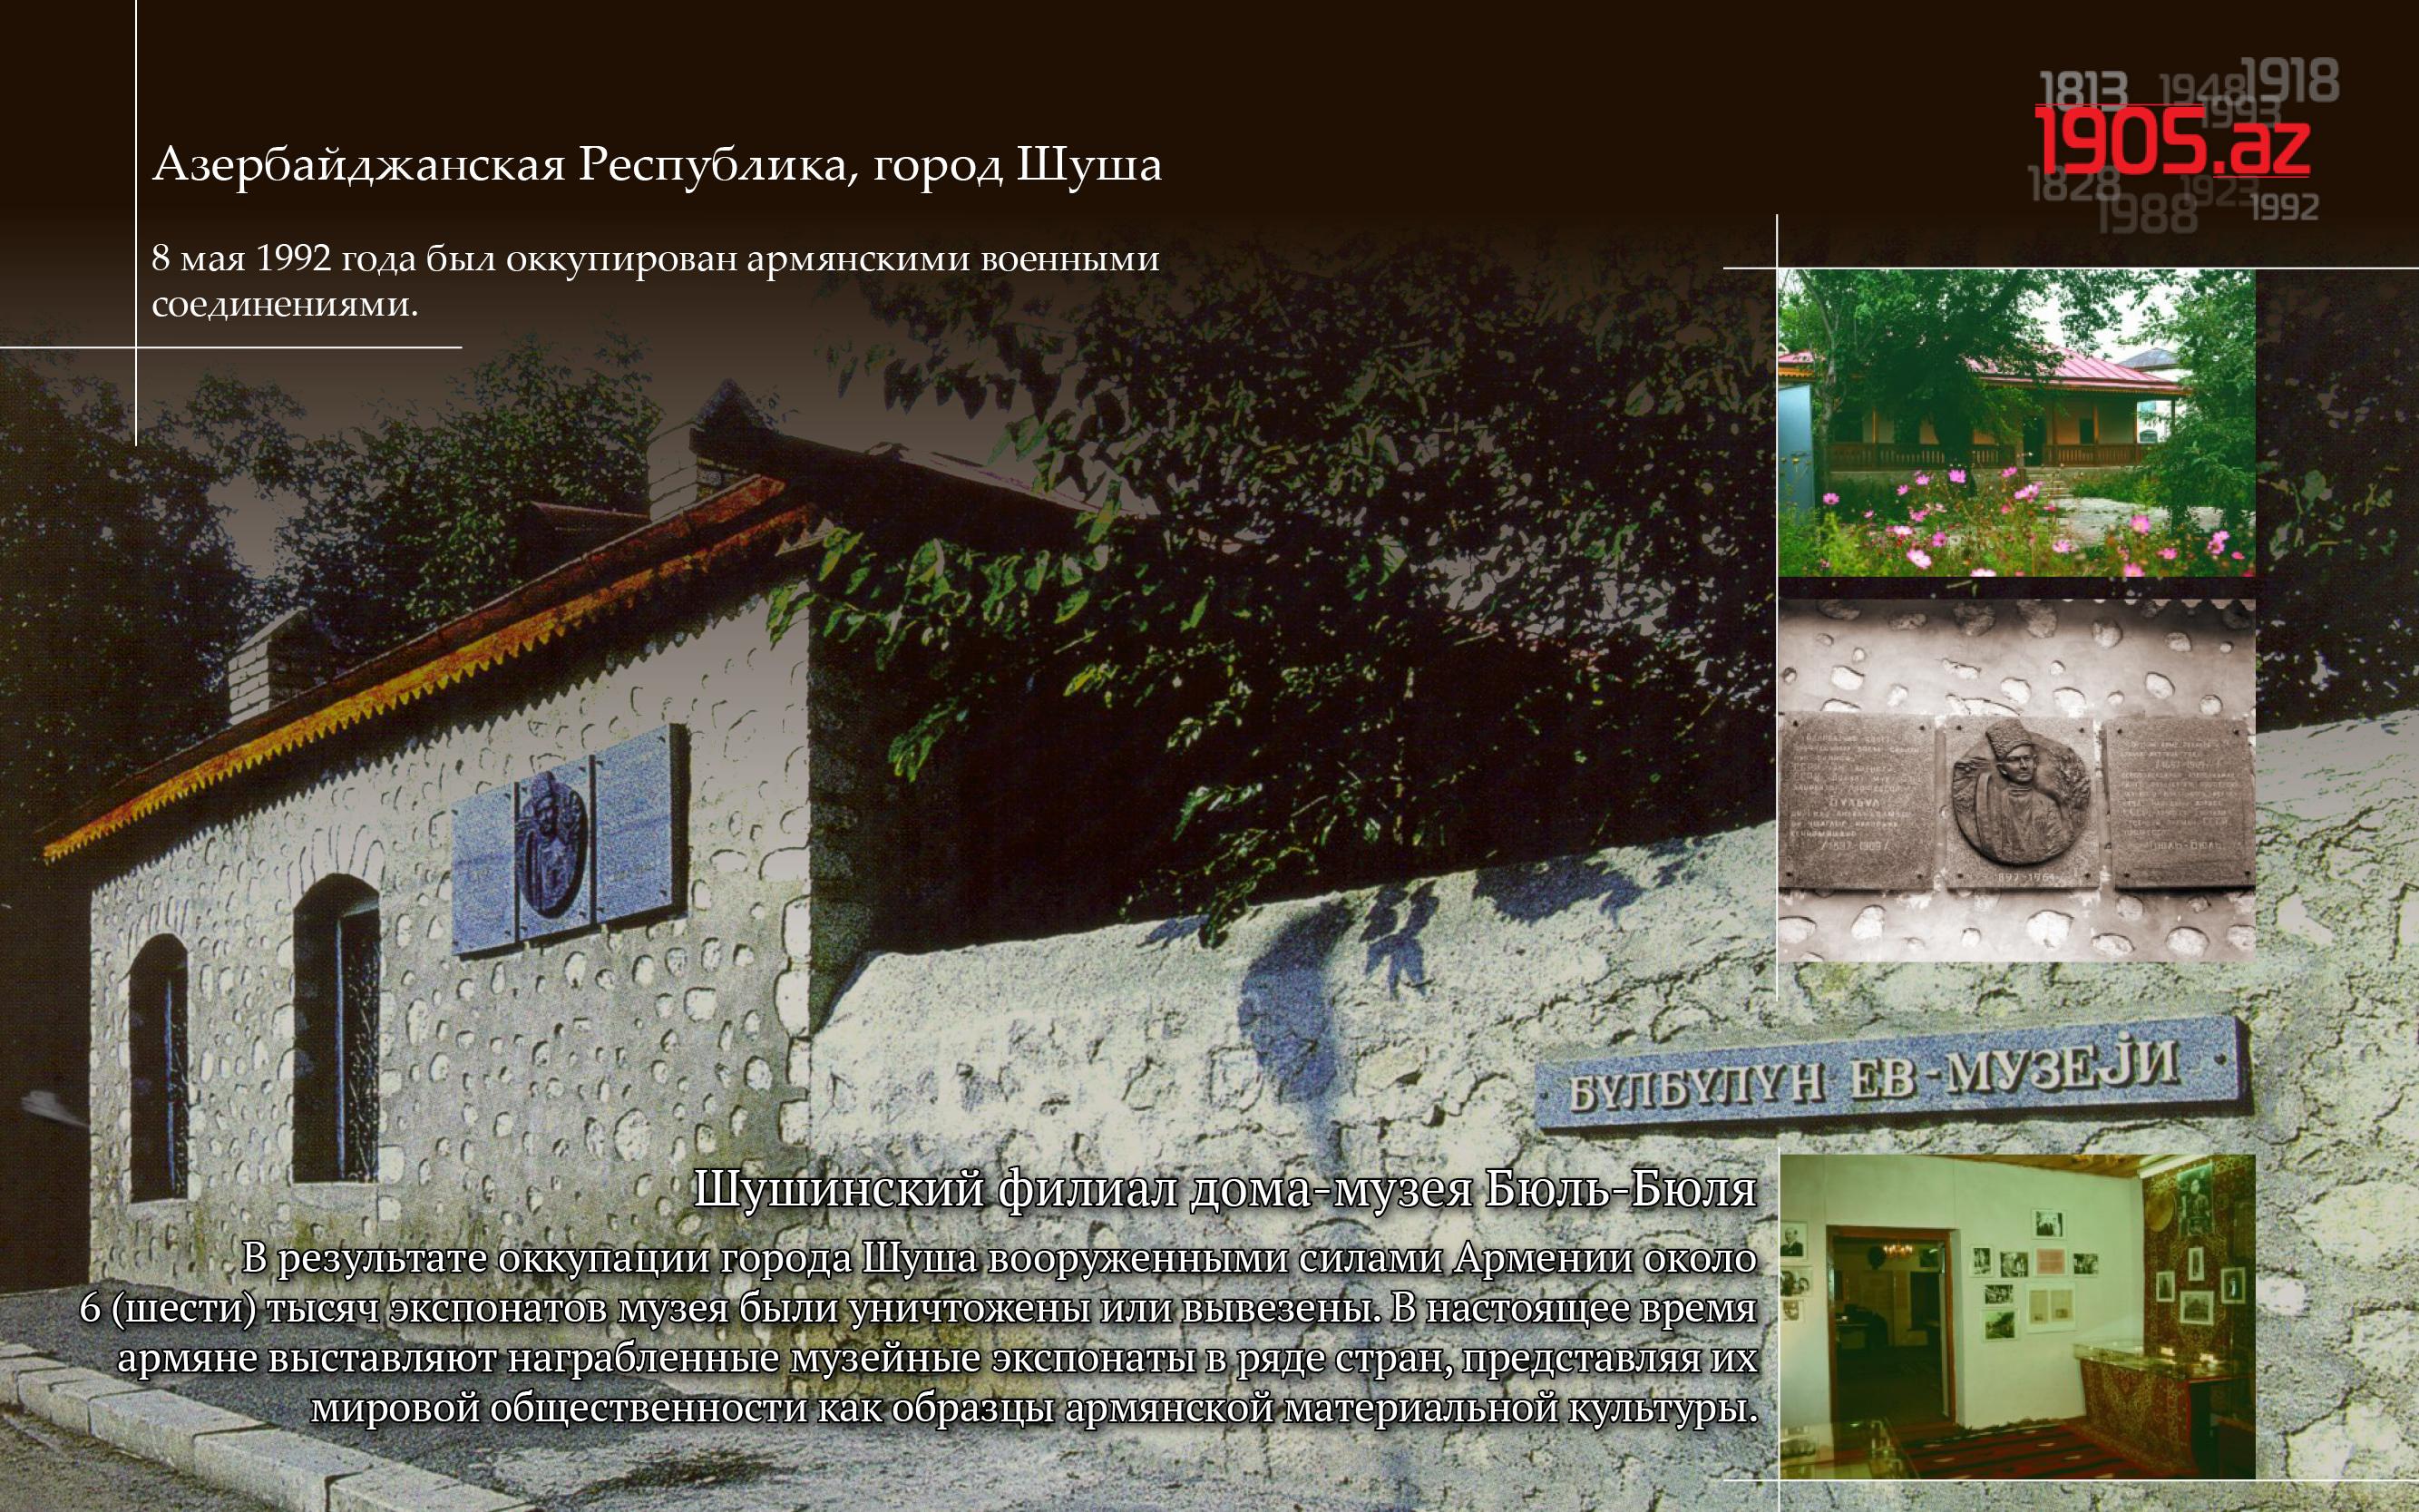 ru_wallpaper_Шушинский филиал дома-музея Бюль-Бюля_